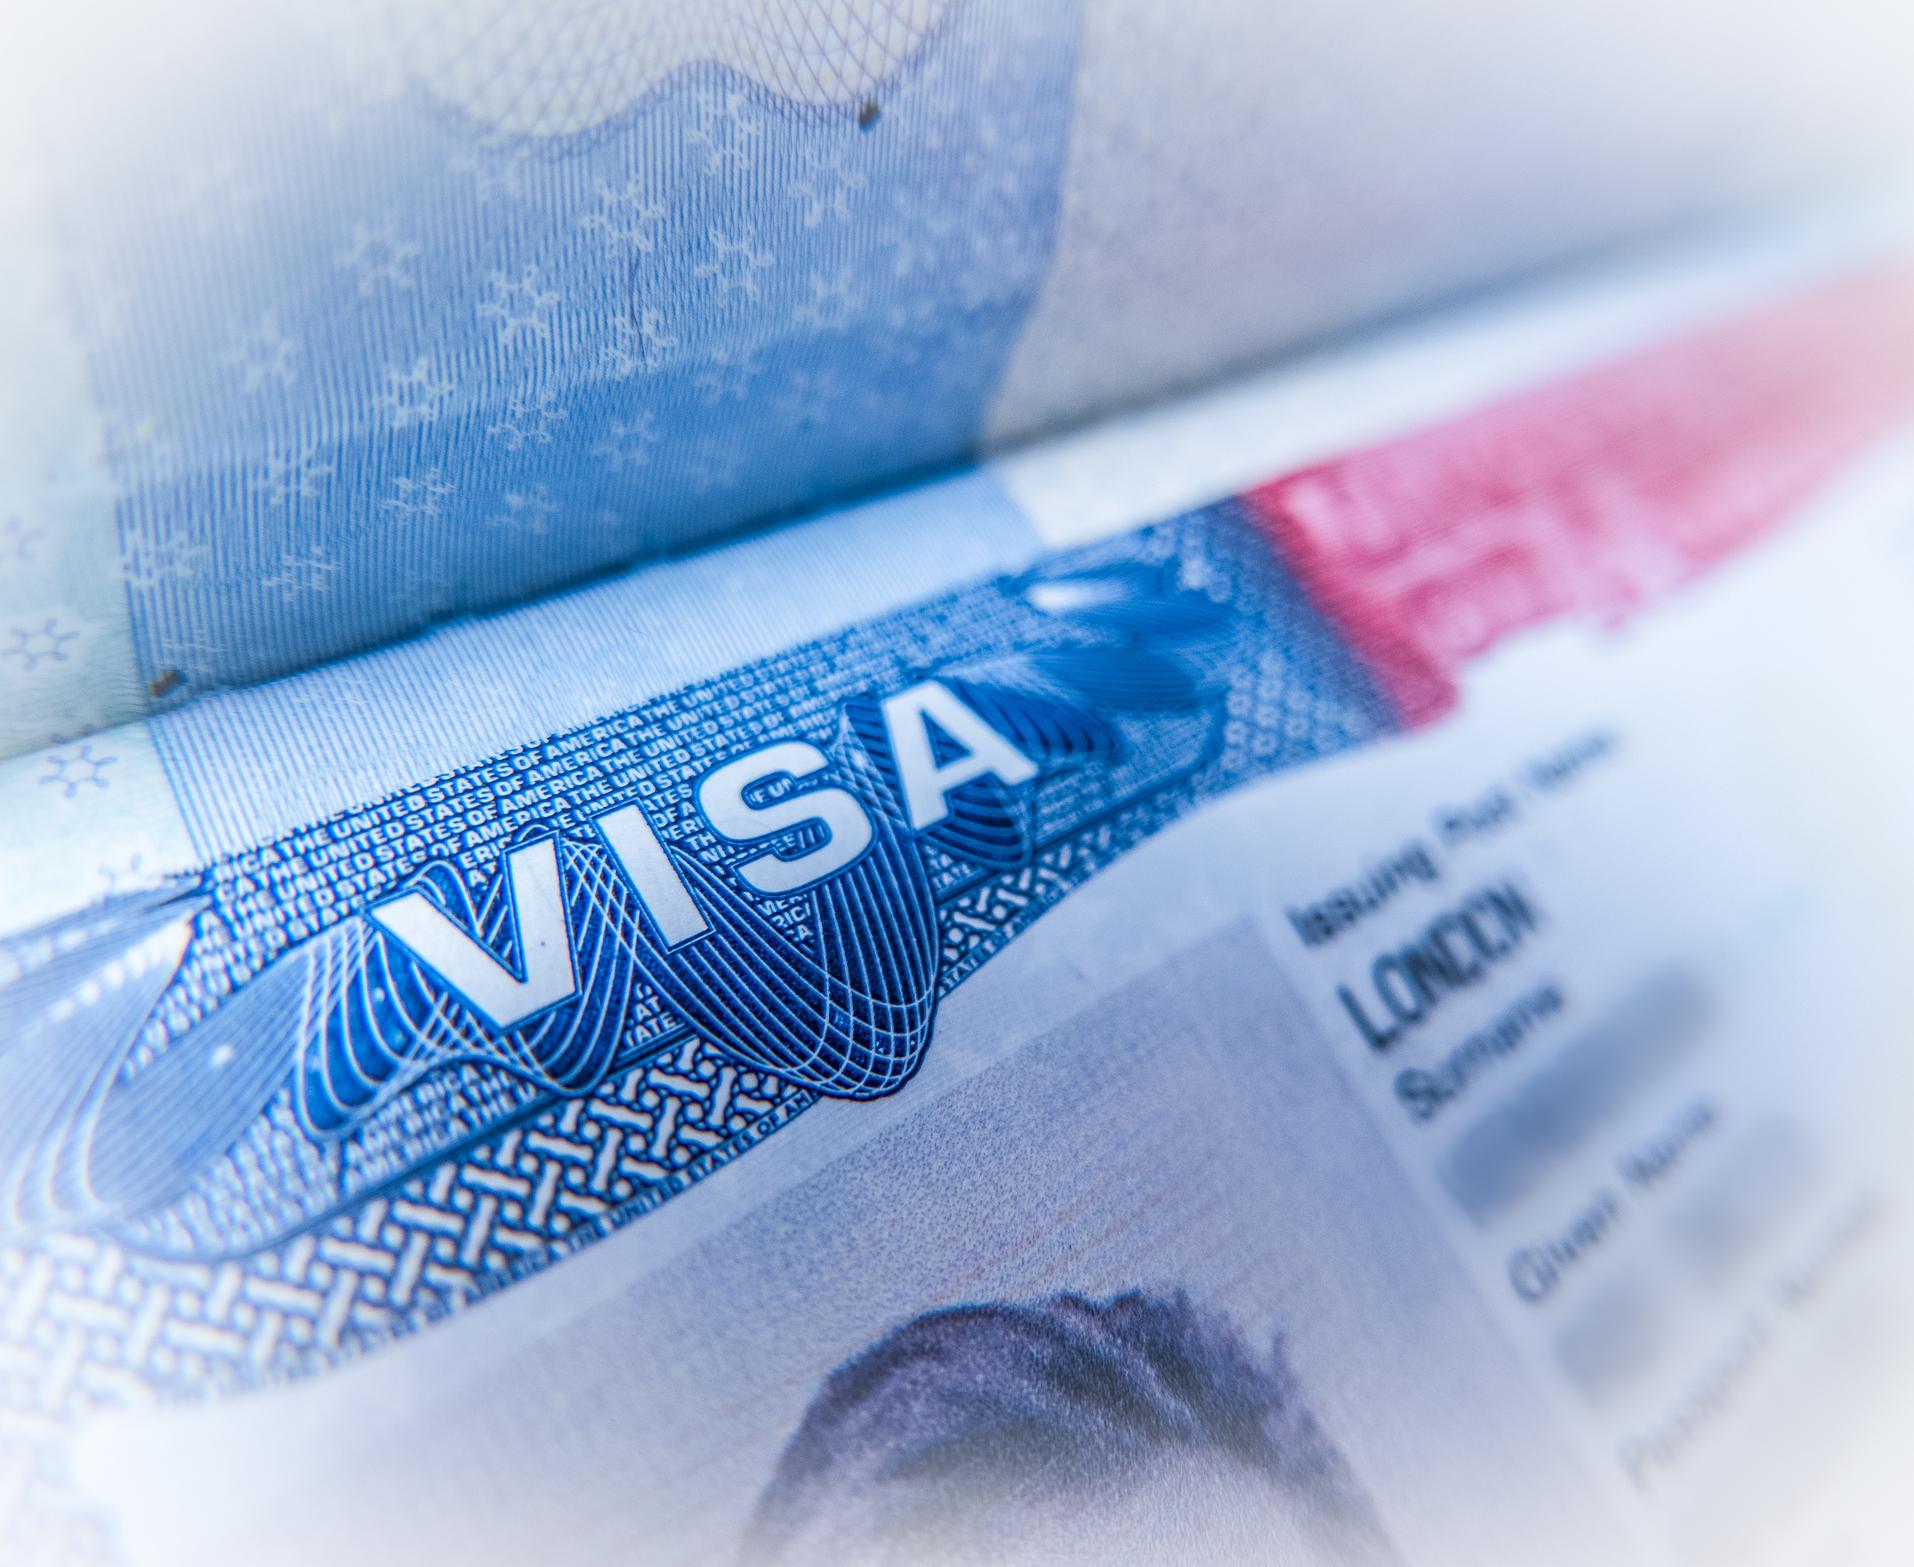 J-1 Visa: Current Clients & Participants